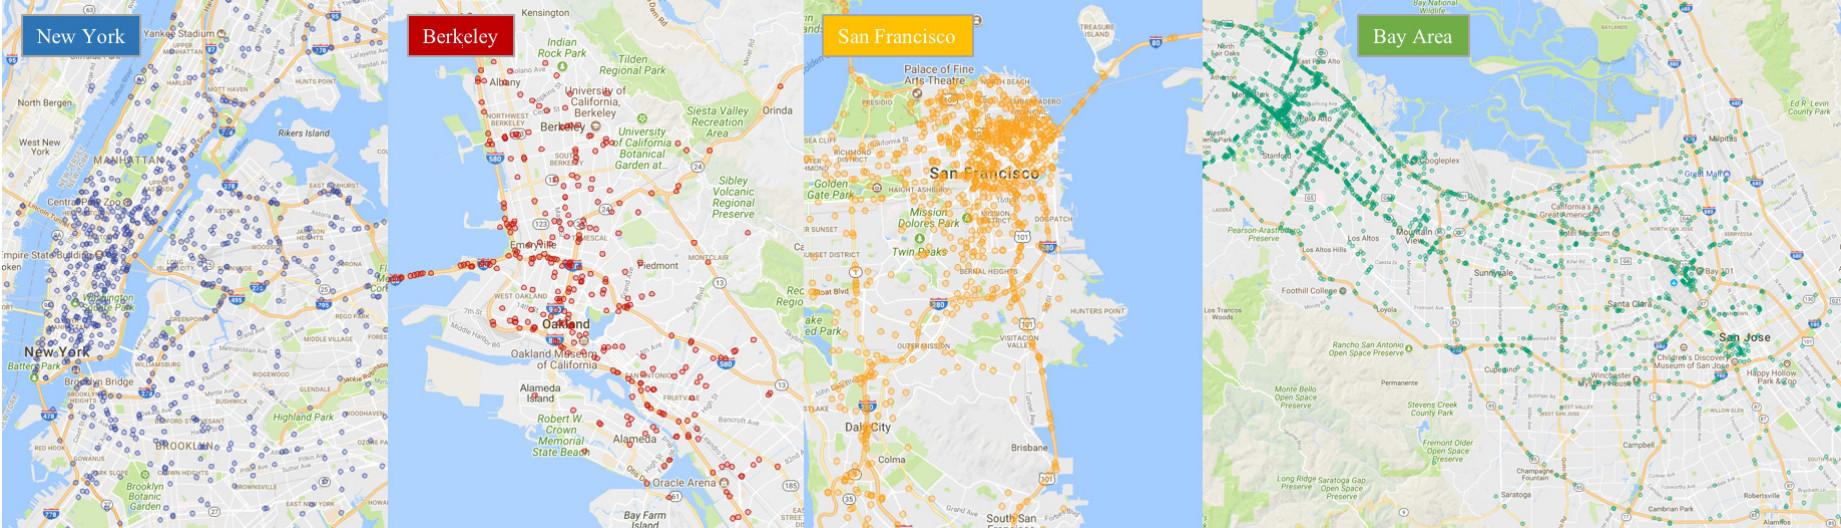 BDD100K Locations